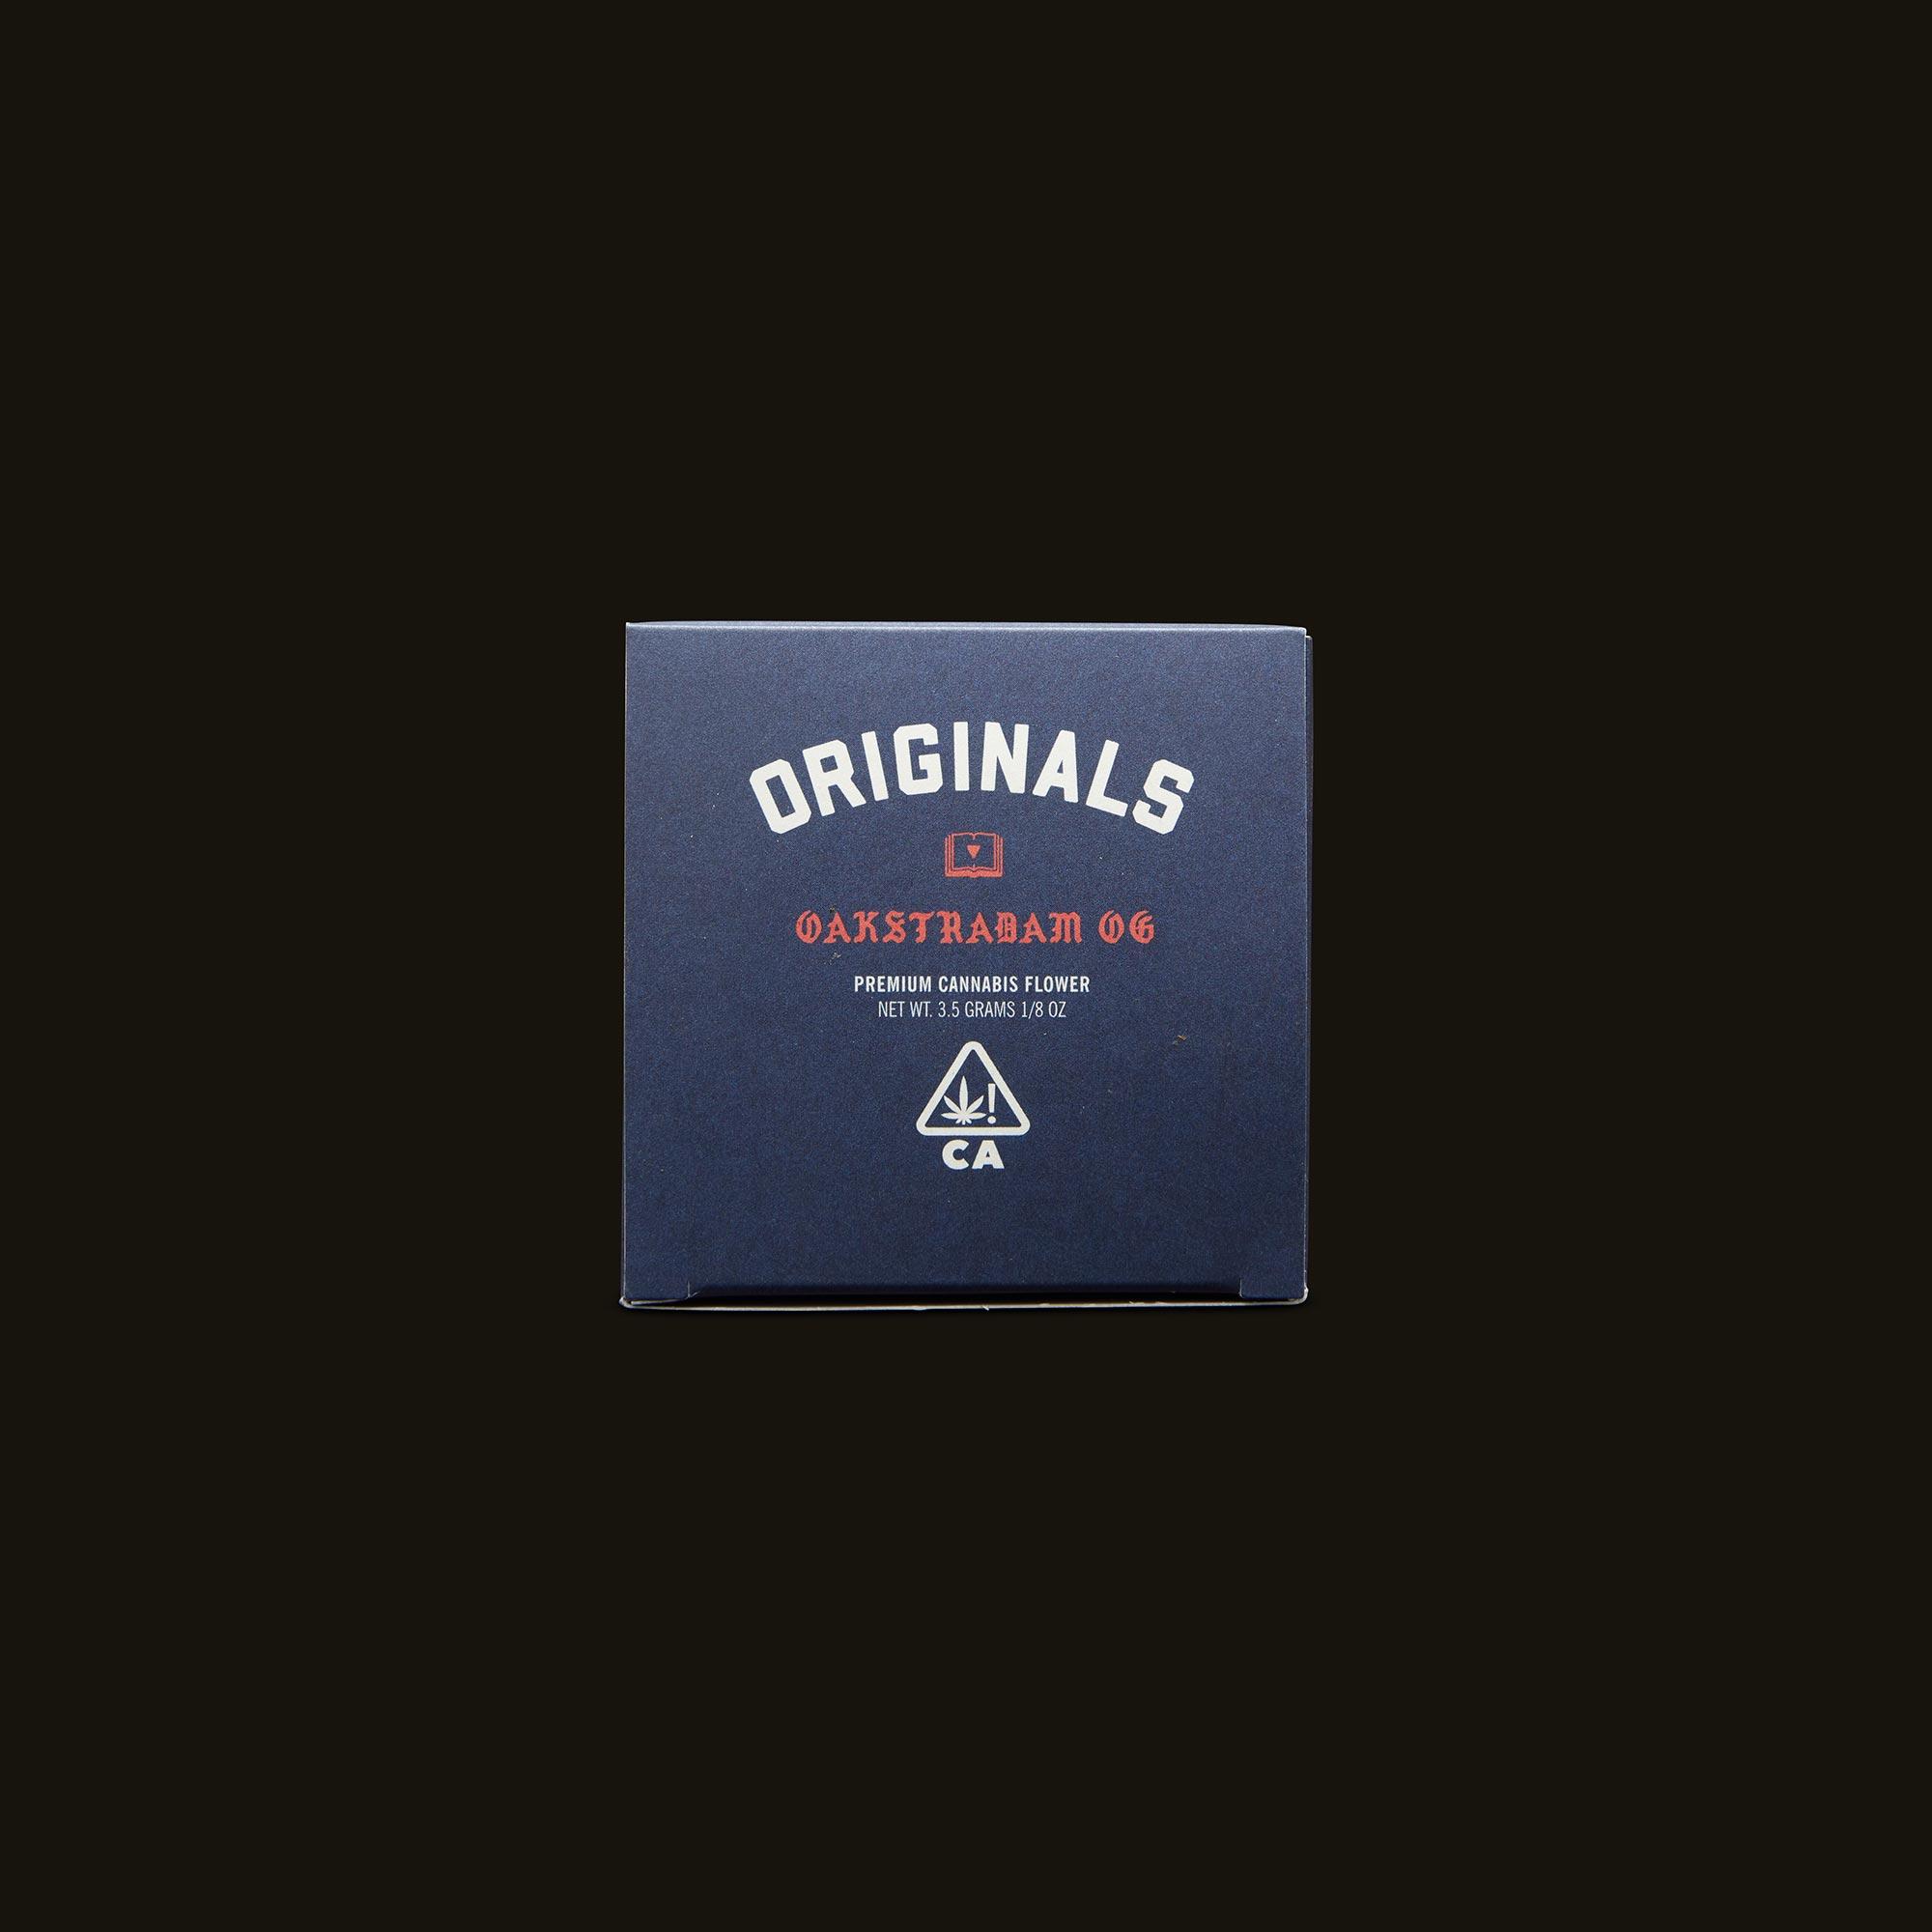 Originals Oakstradam OG Top Packaging